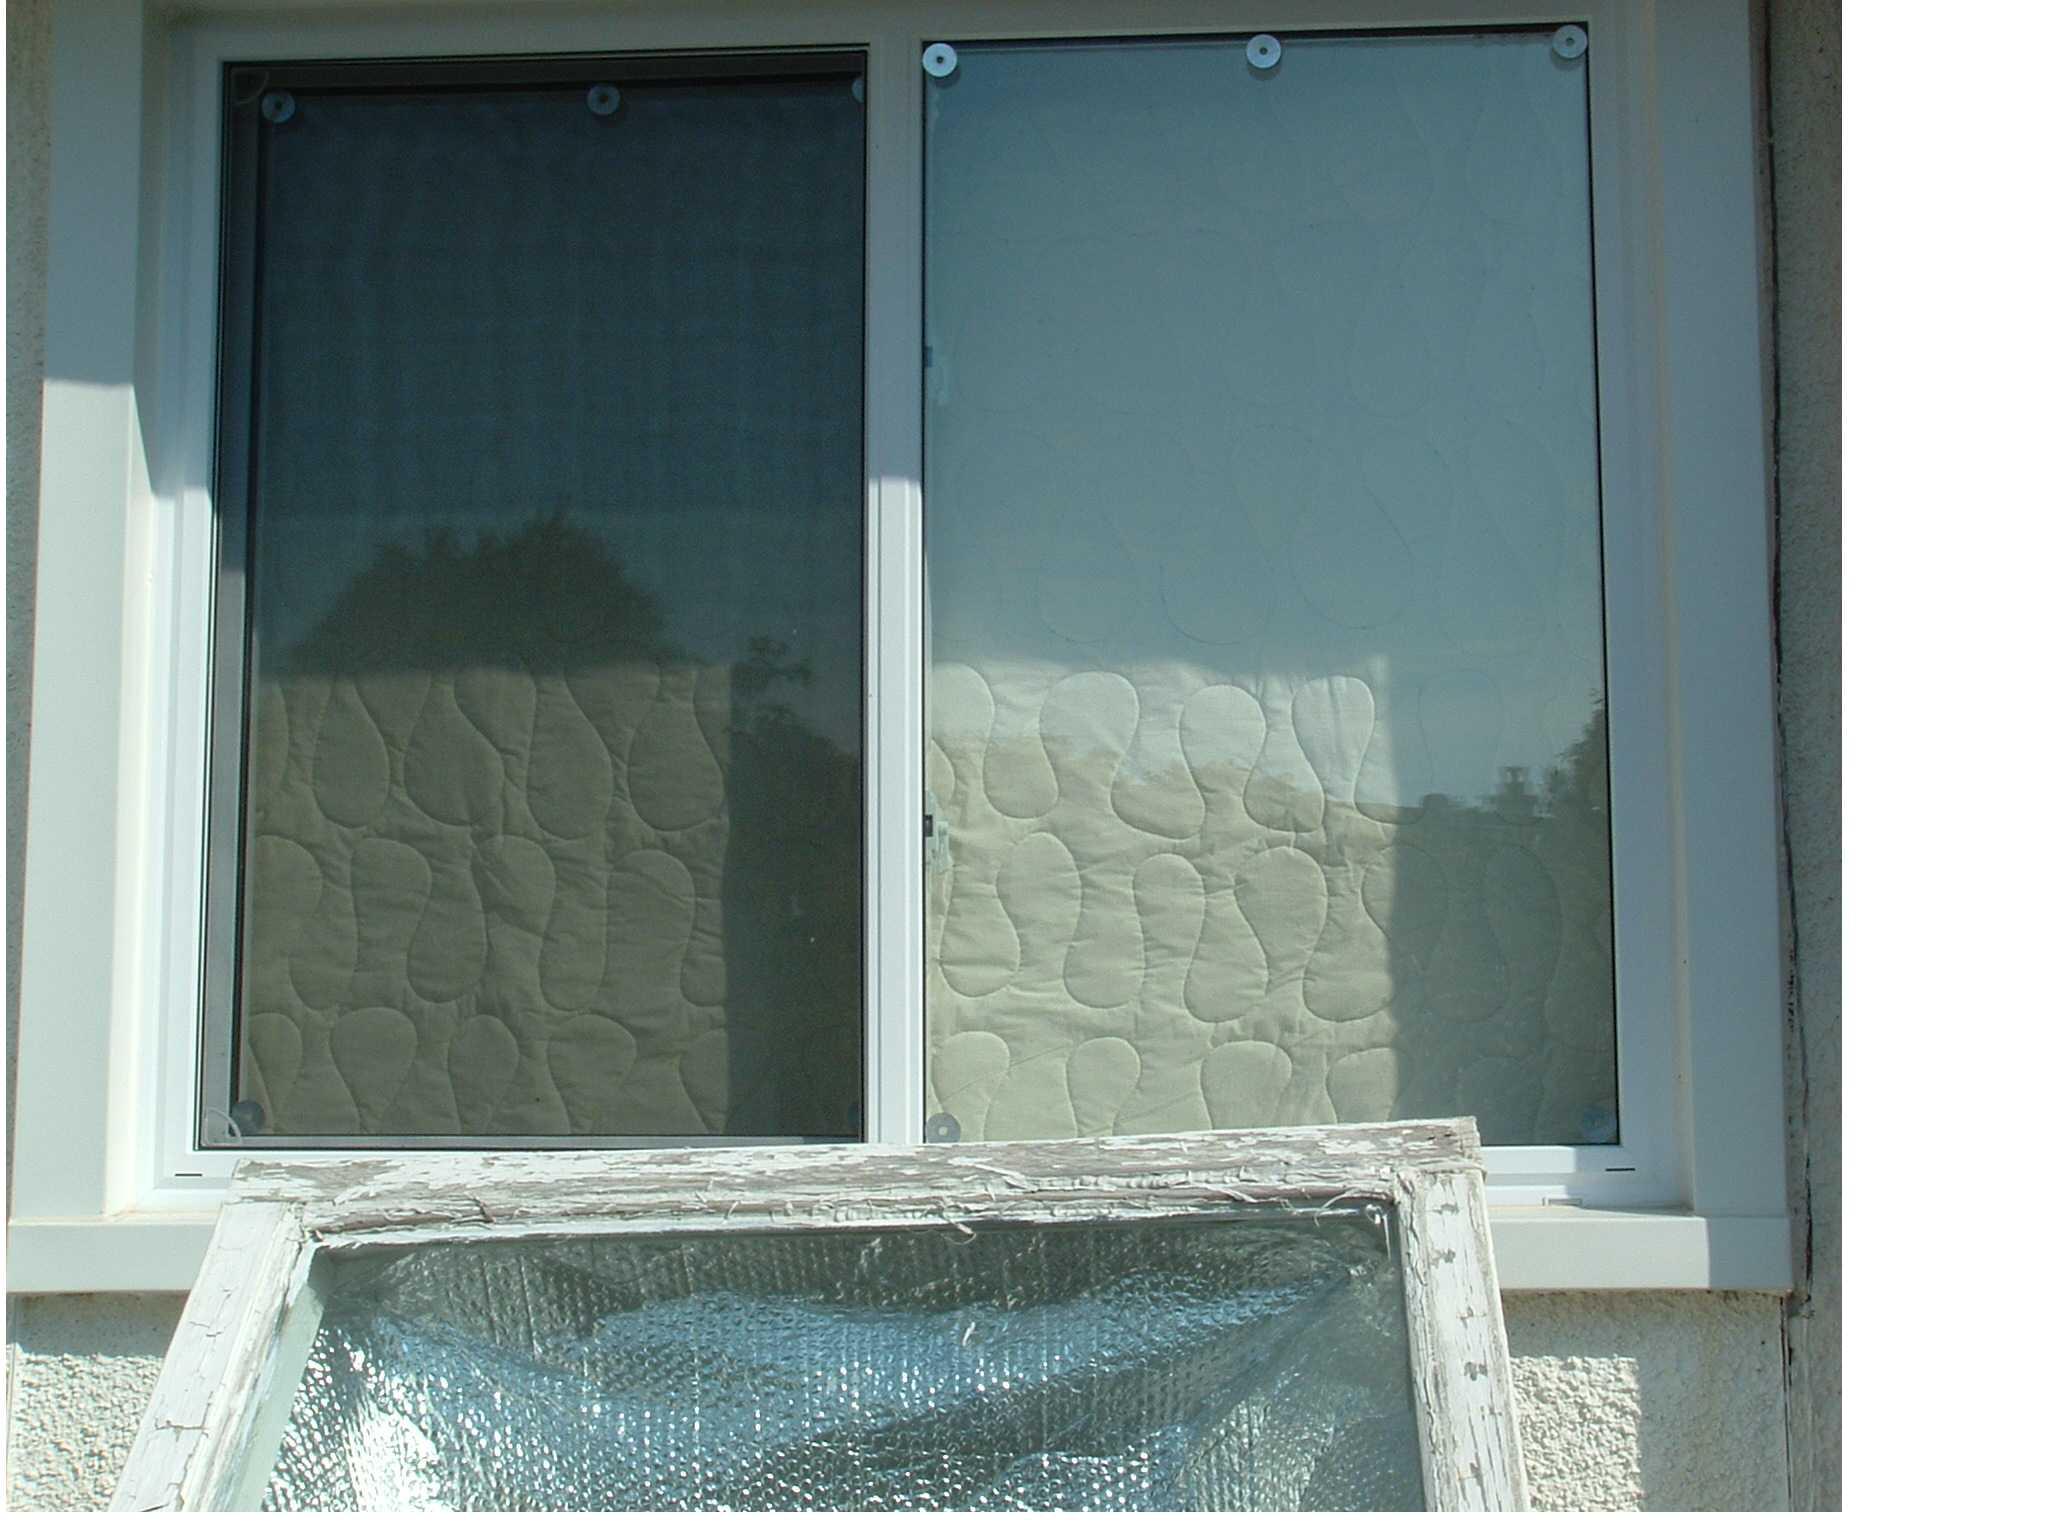 3m outdoor window insulator kit instructions